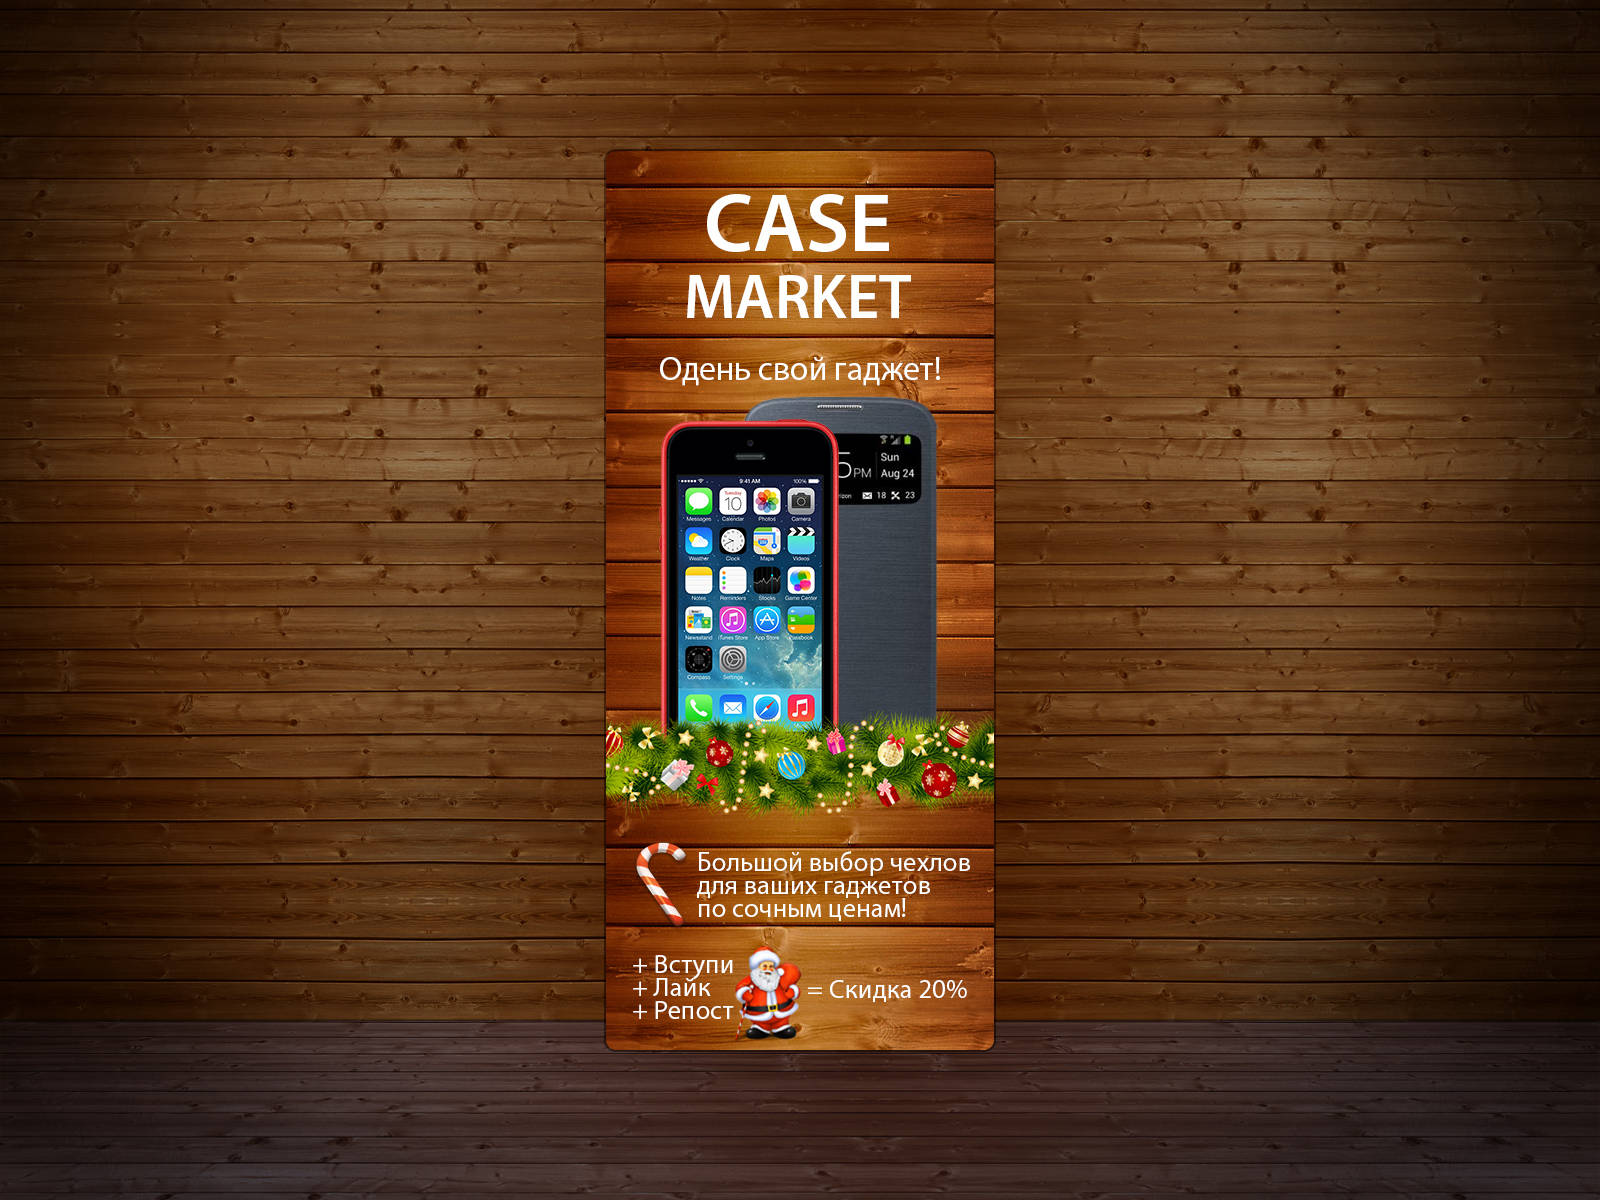 Case Market